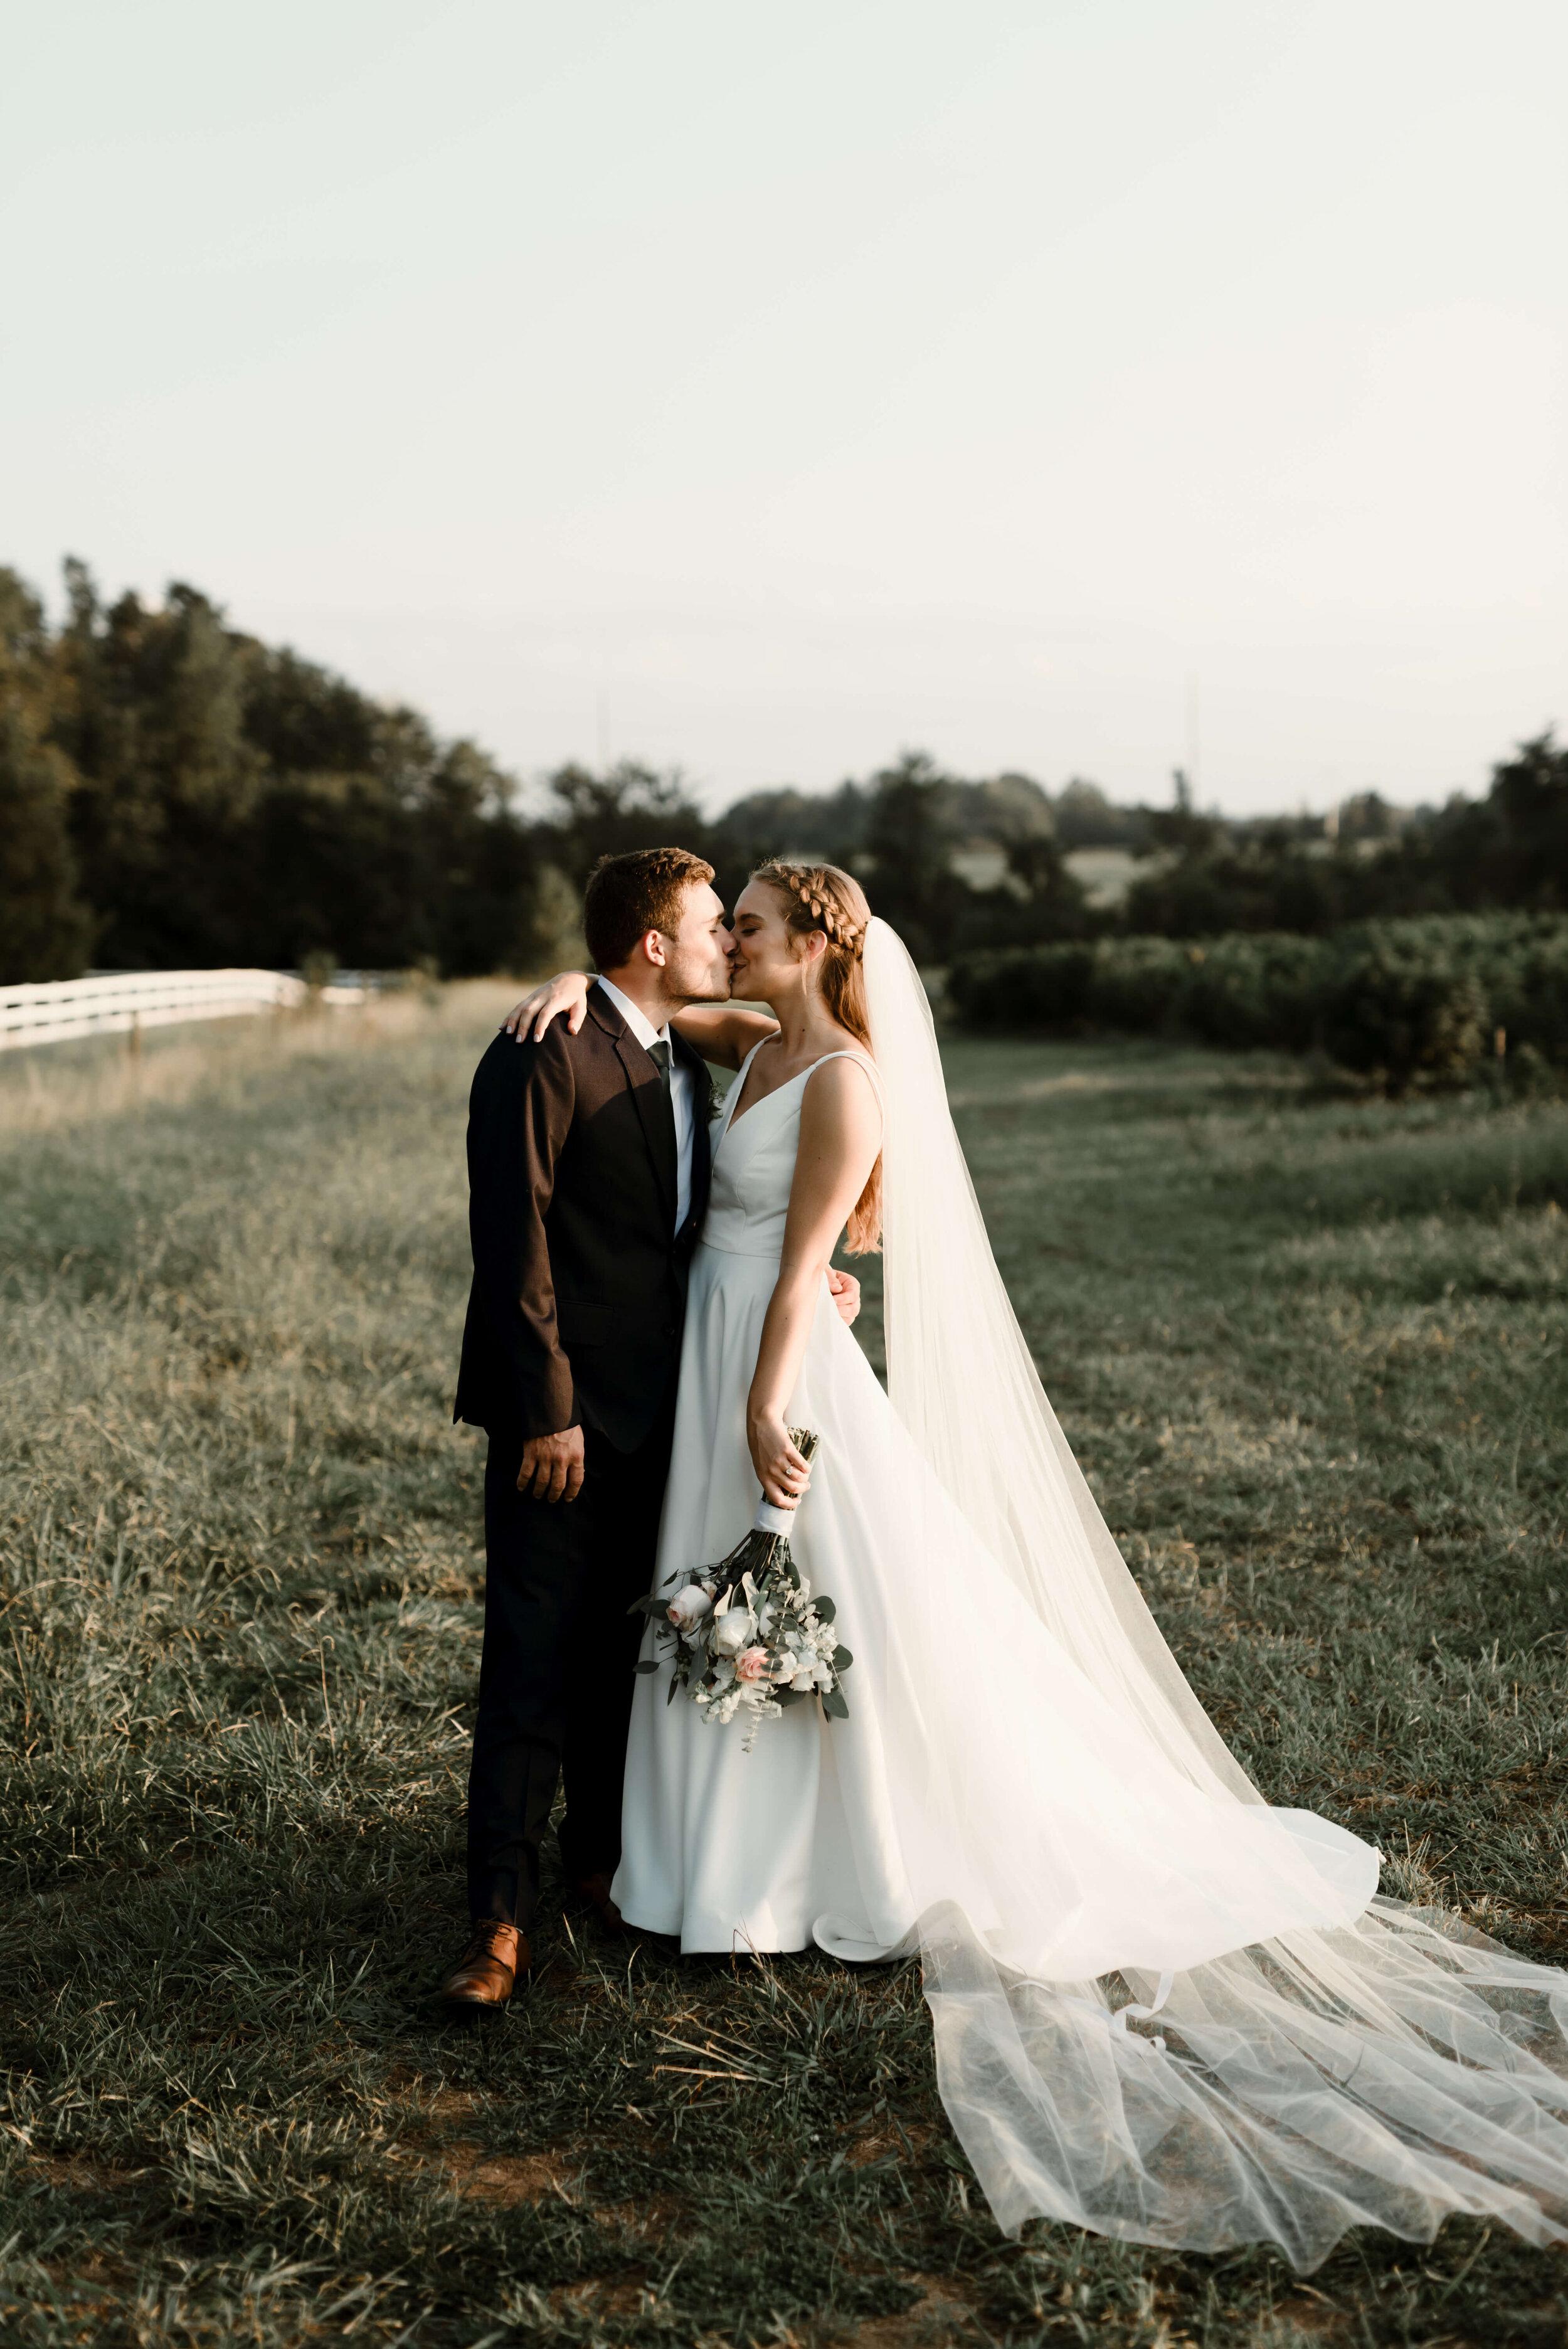 RALEIGH_WEDDING_GABBY_AND_SMITTYDSC_7984.jpg